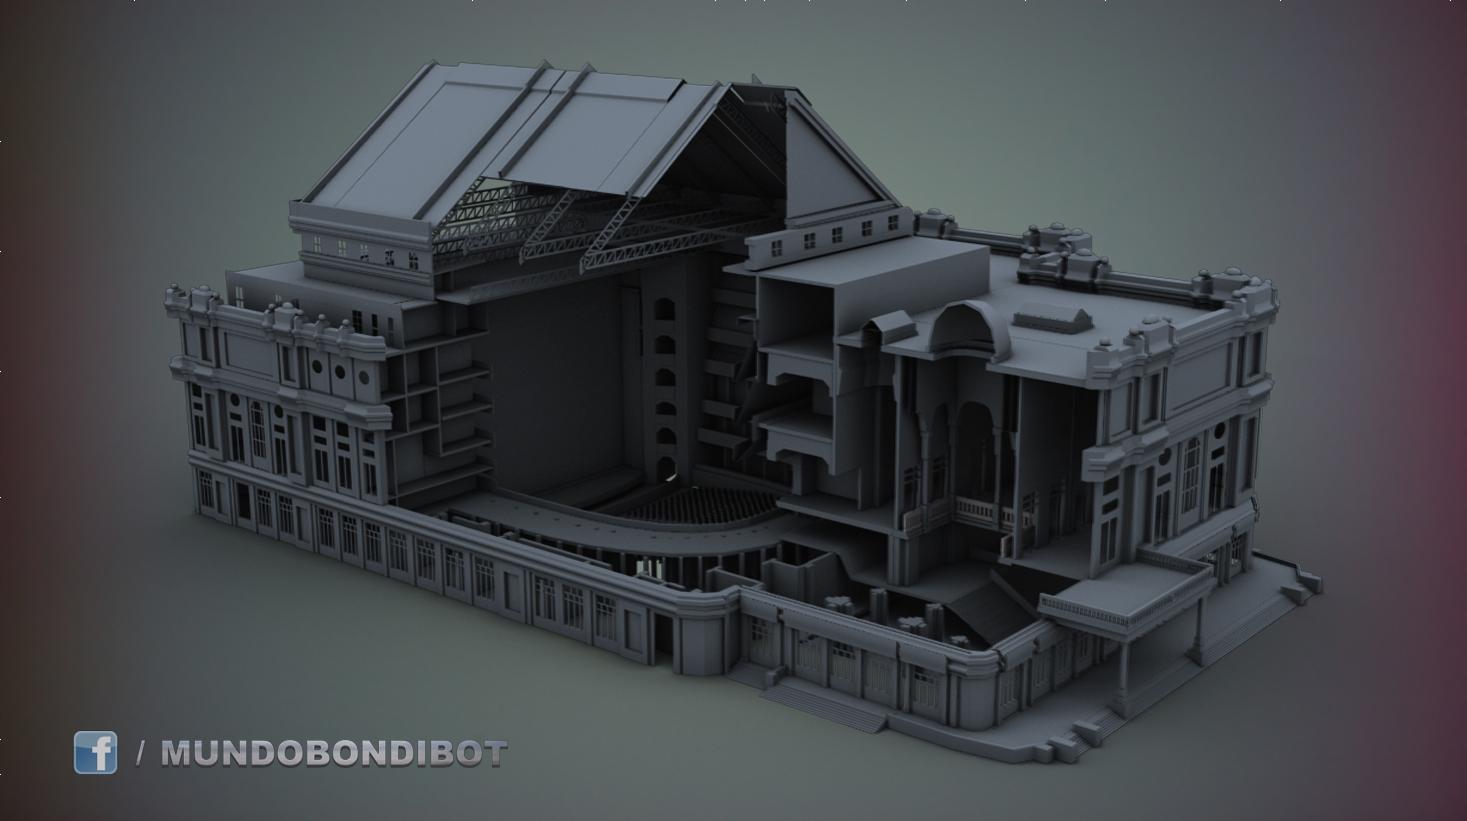 Teatro Colon 3d